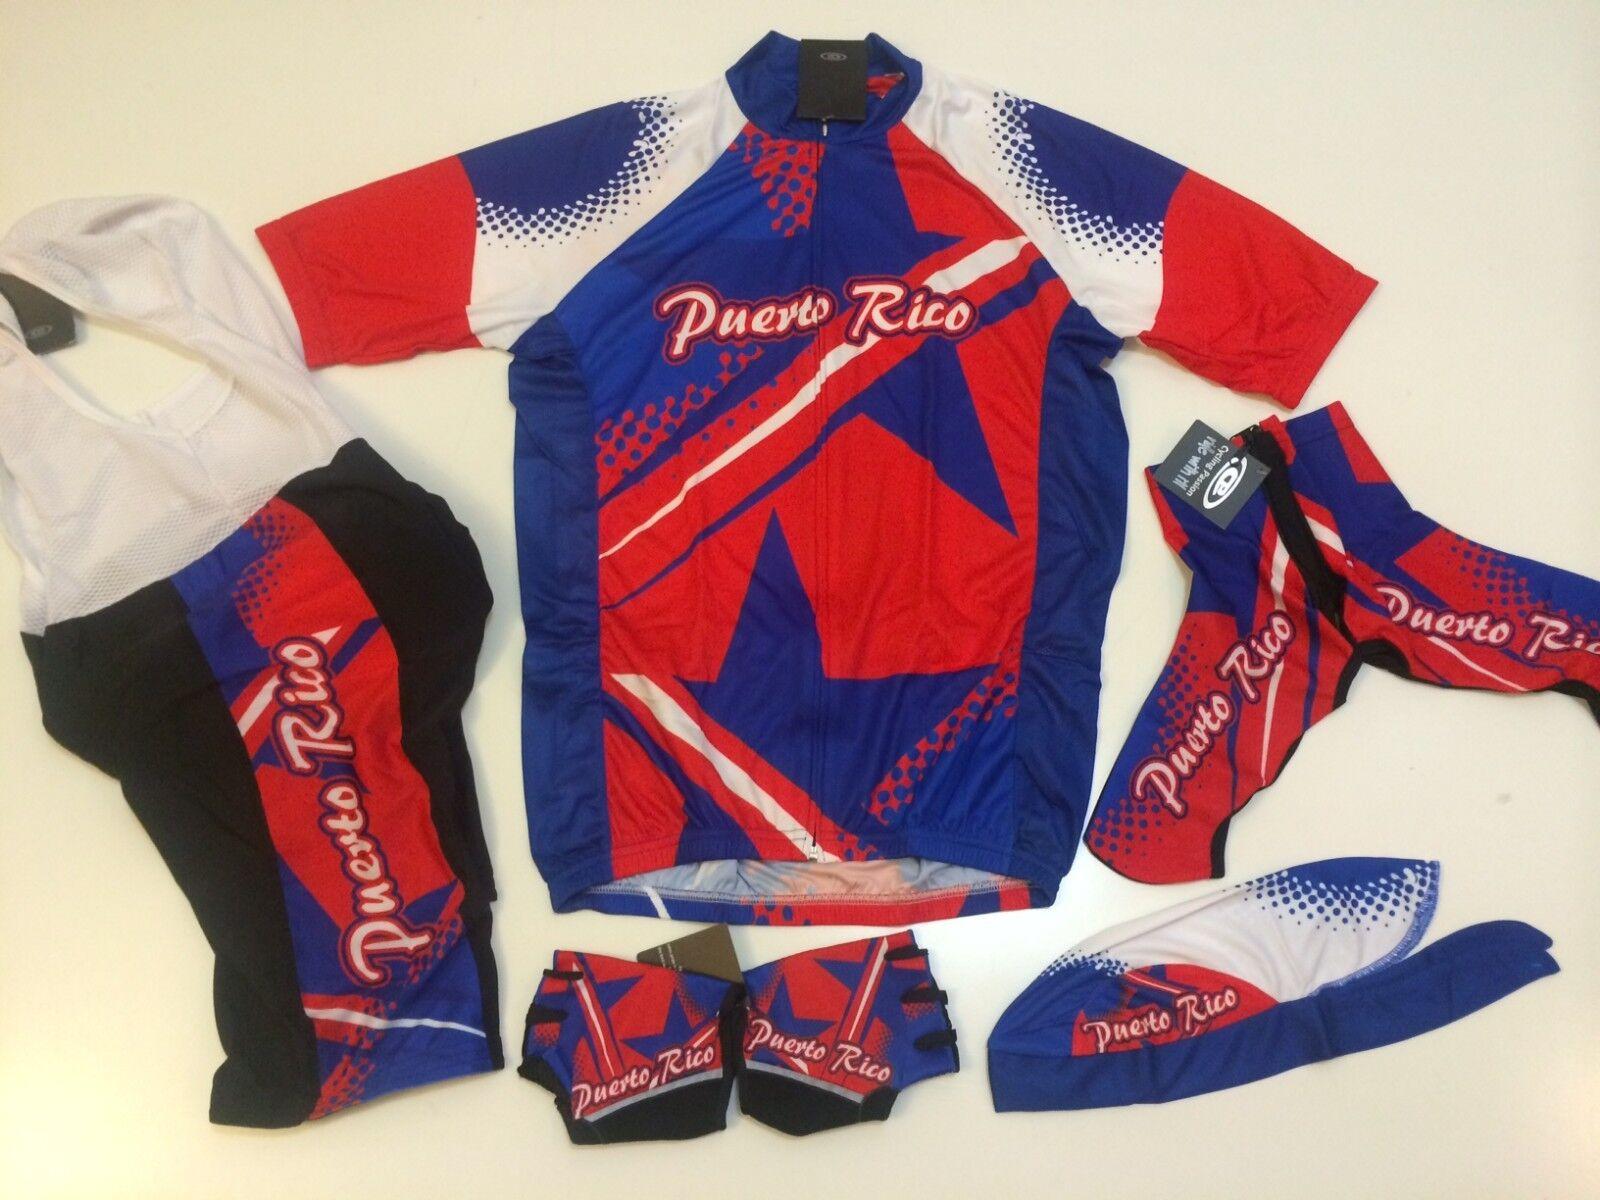 New Größe S - PUERTO RICO RICO PUERTO Team Cycling Bike Set Flag Jersey Bib Shorts Gloves + 3cd1b6